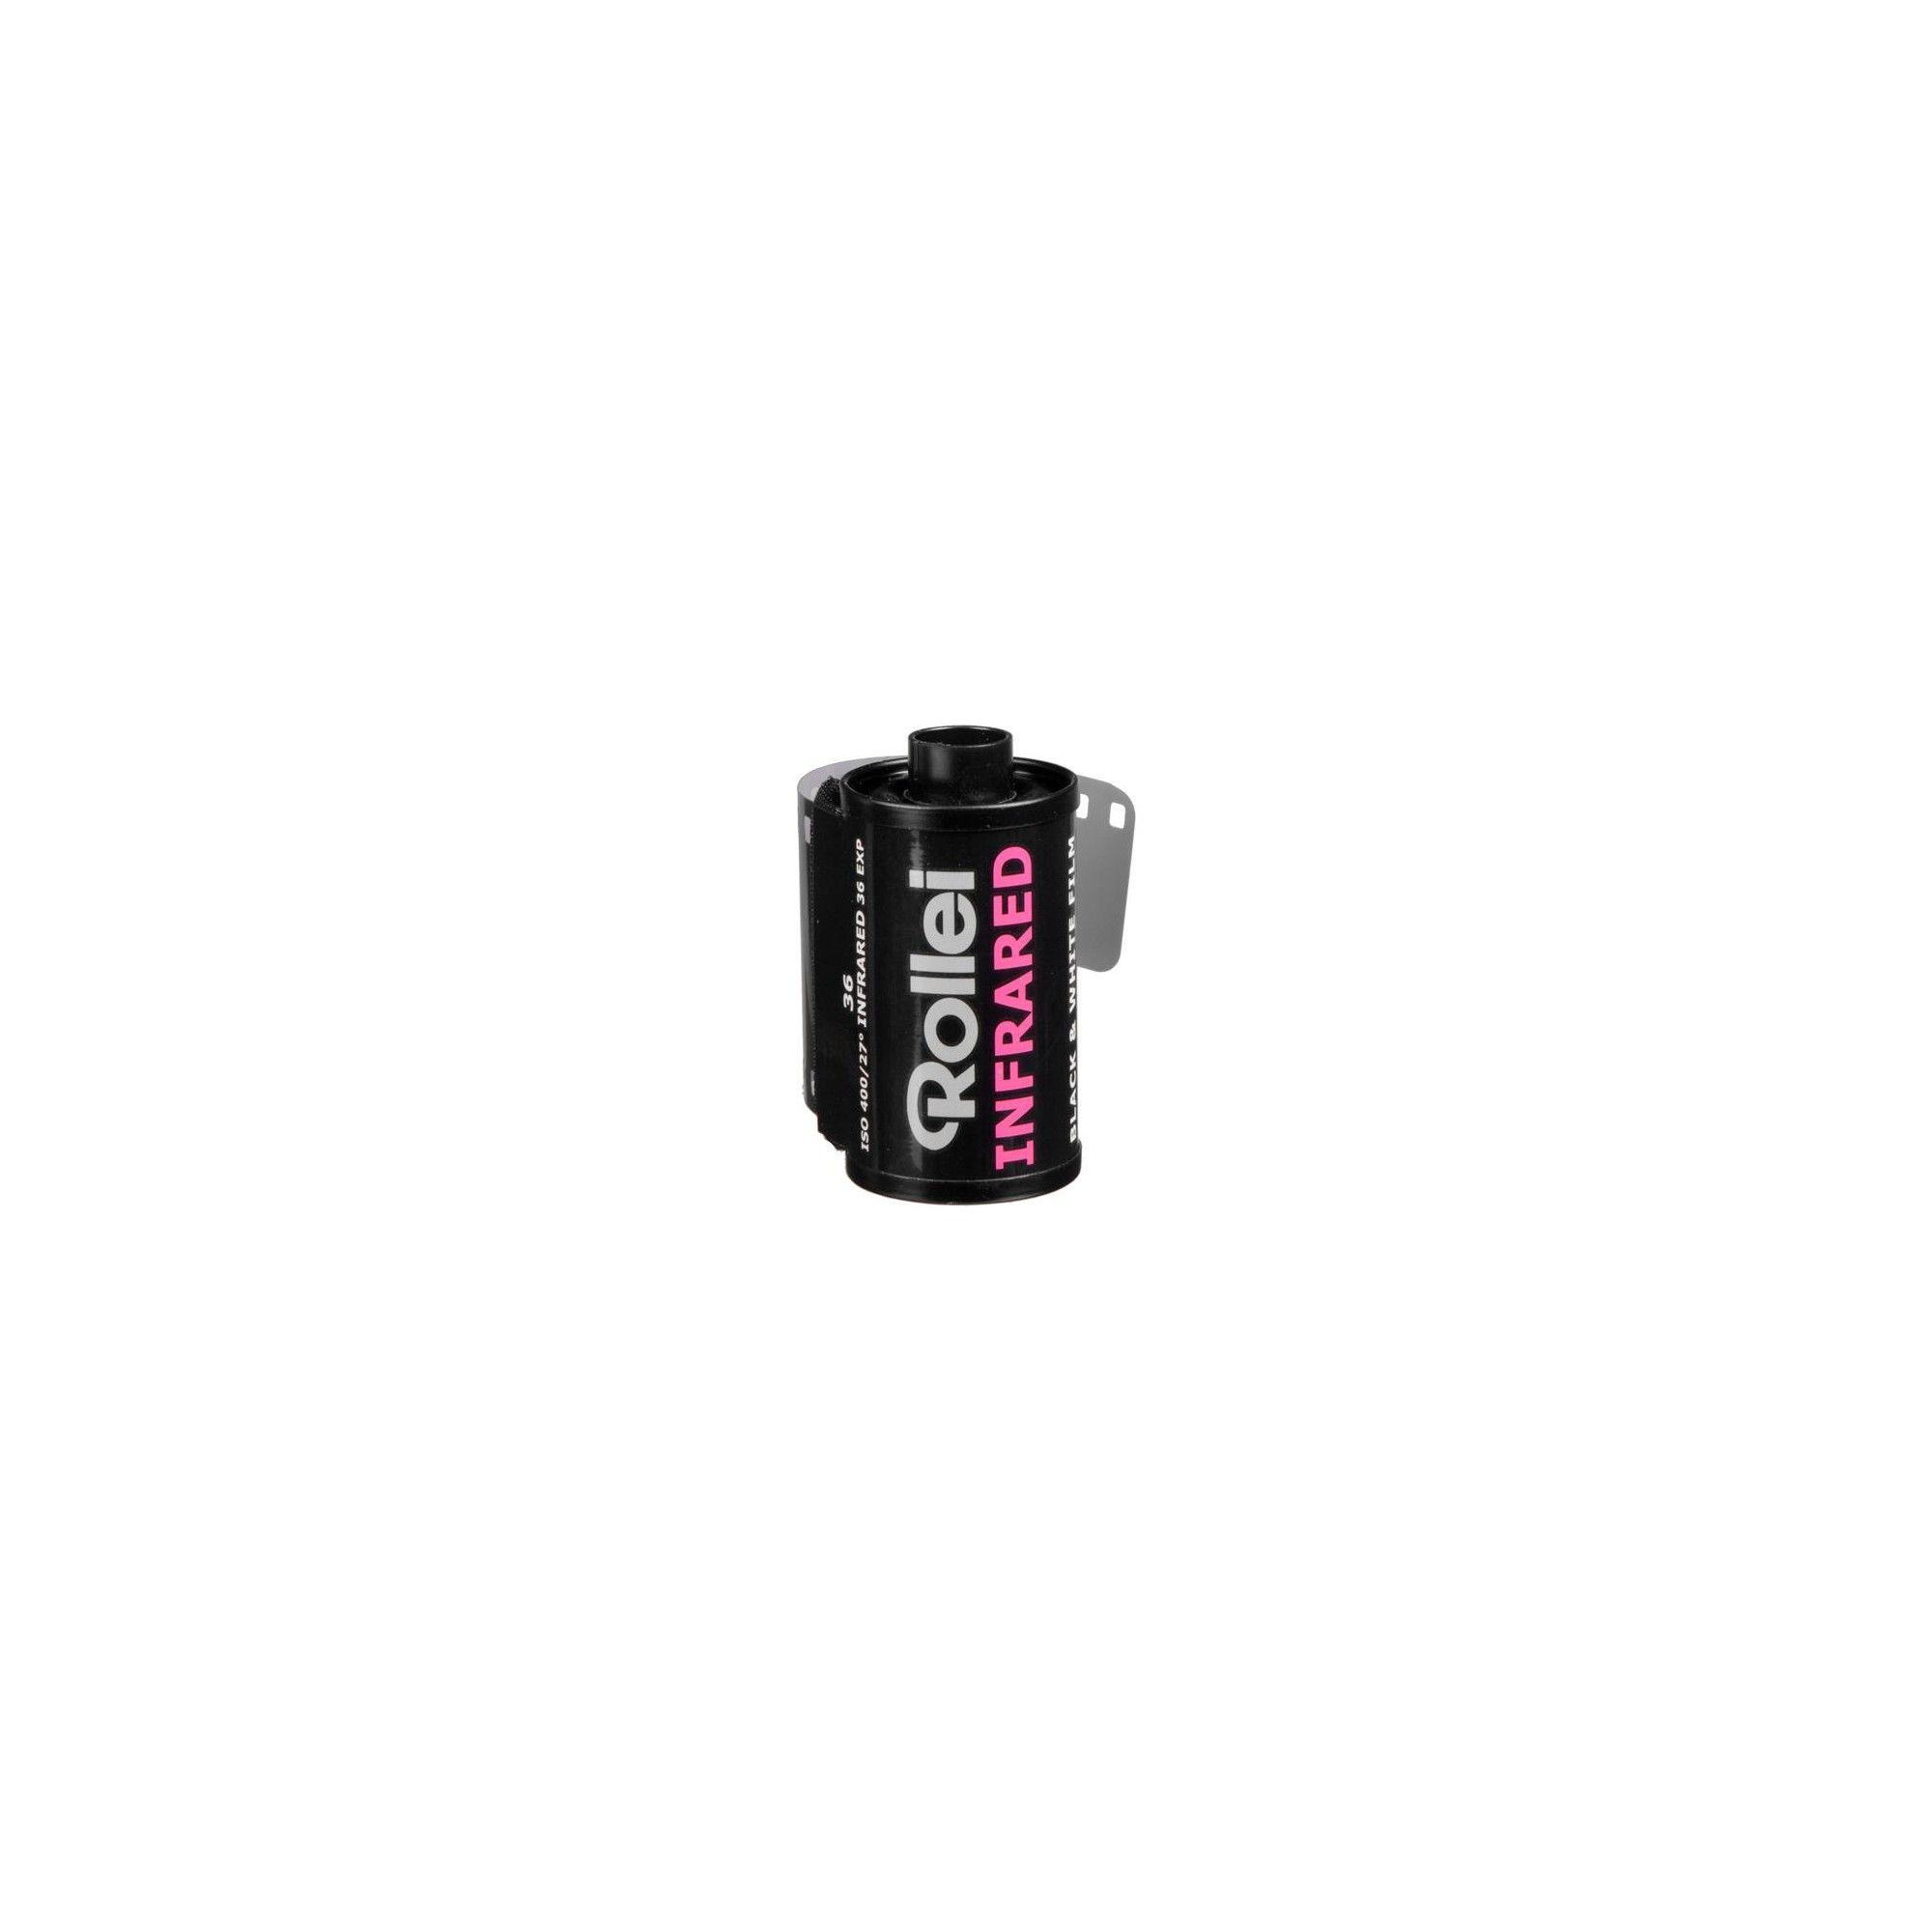 36 Exposure Rollei Infared 400 ISO Black /& White Film 35mm